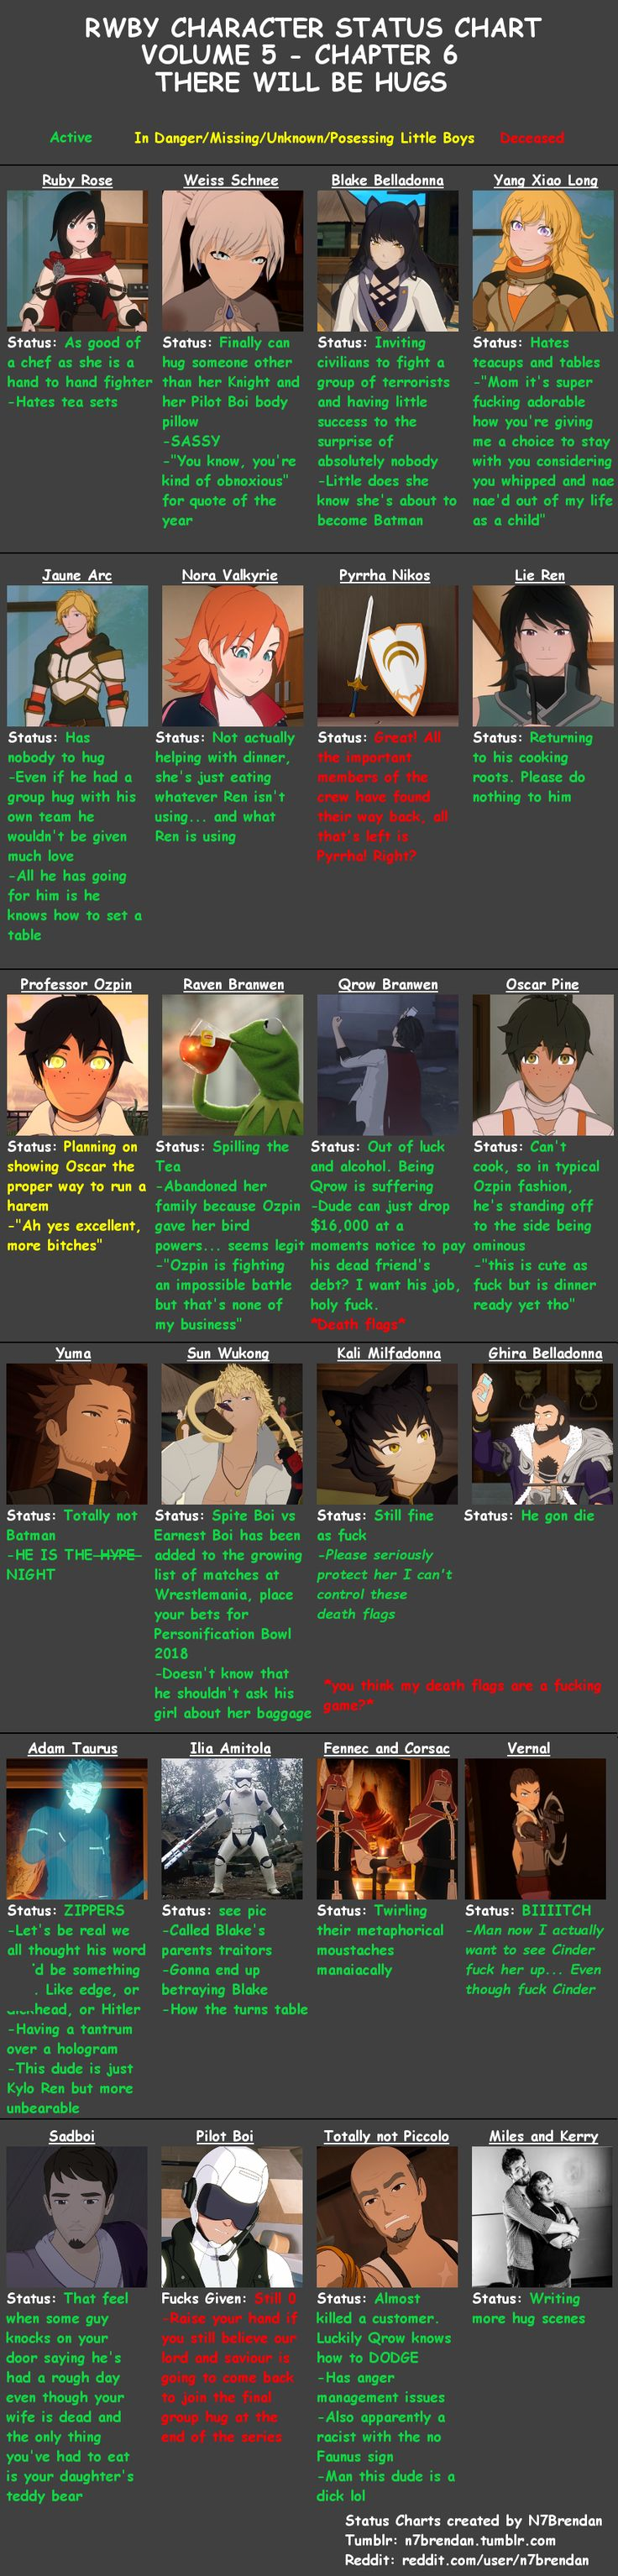 RWBY Character Status Chart Volume 5 Episode 6